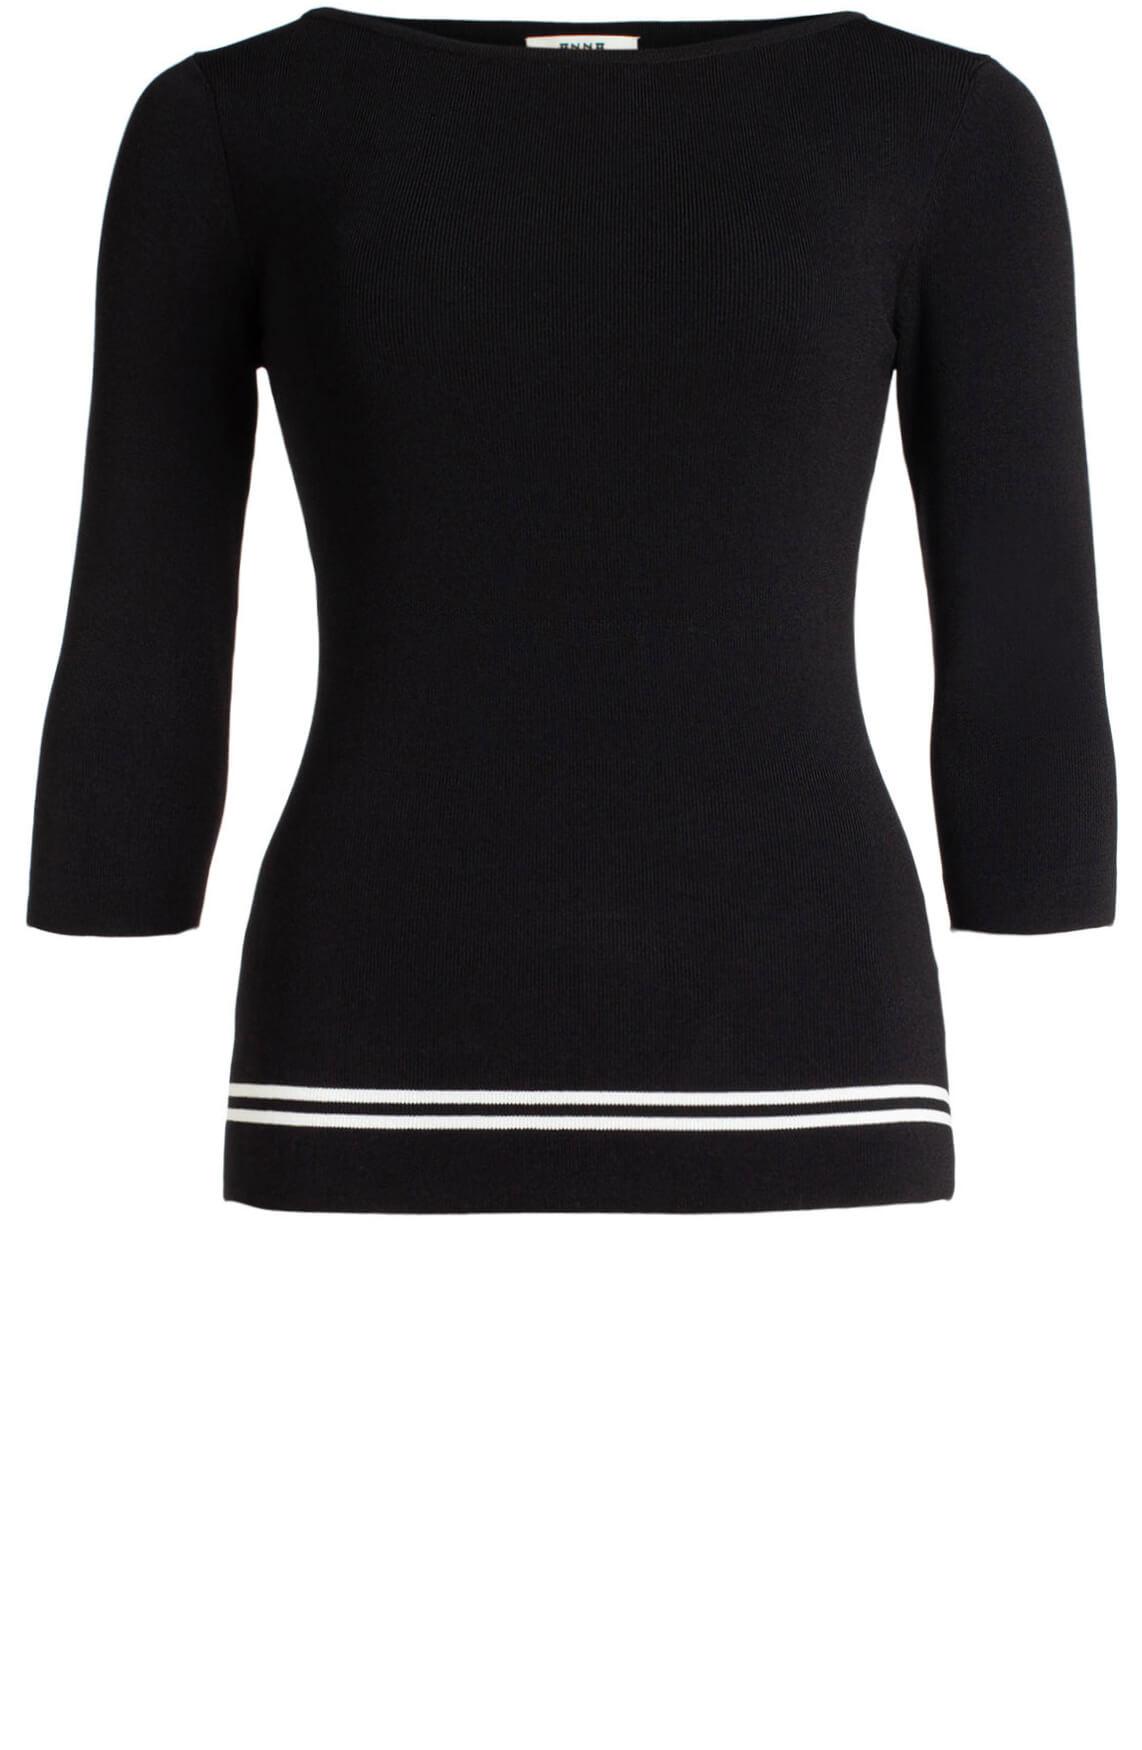 Anna Dames Pullover met streepdetail zwart